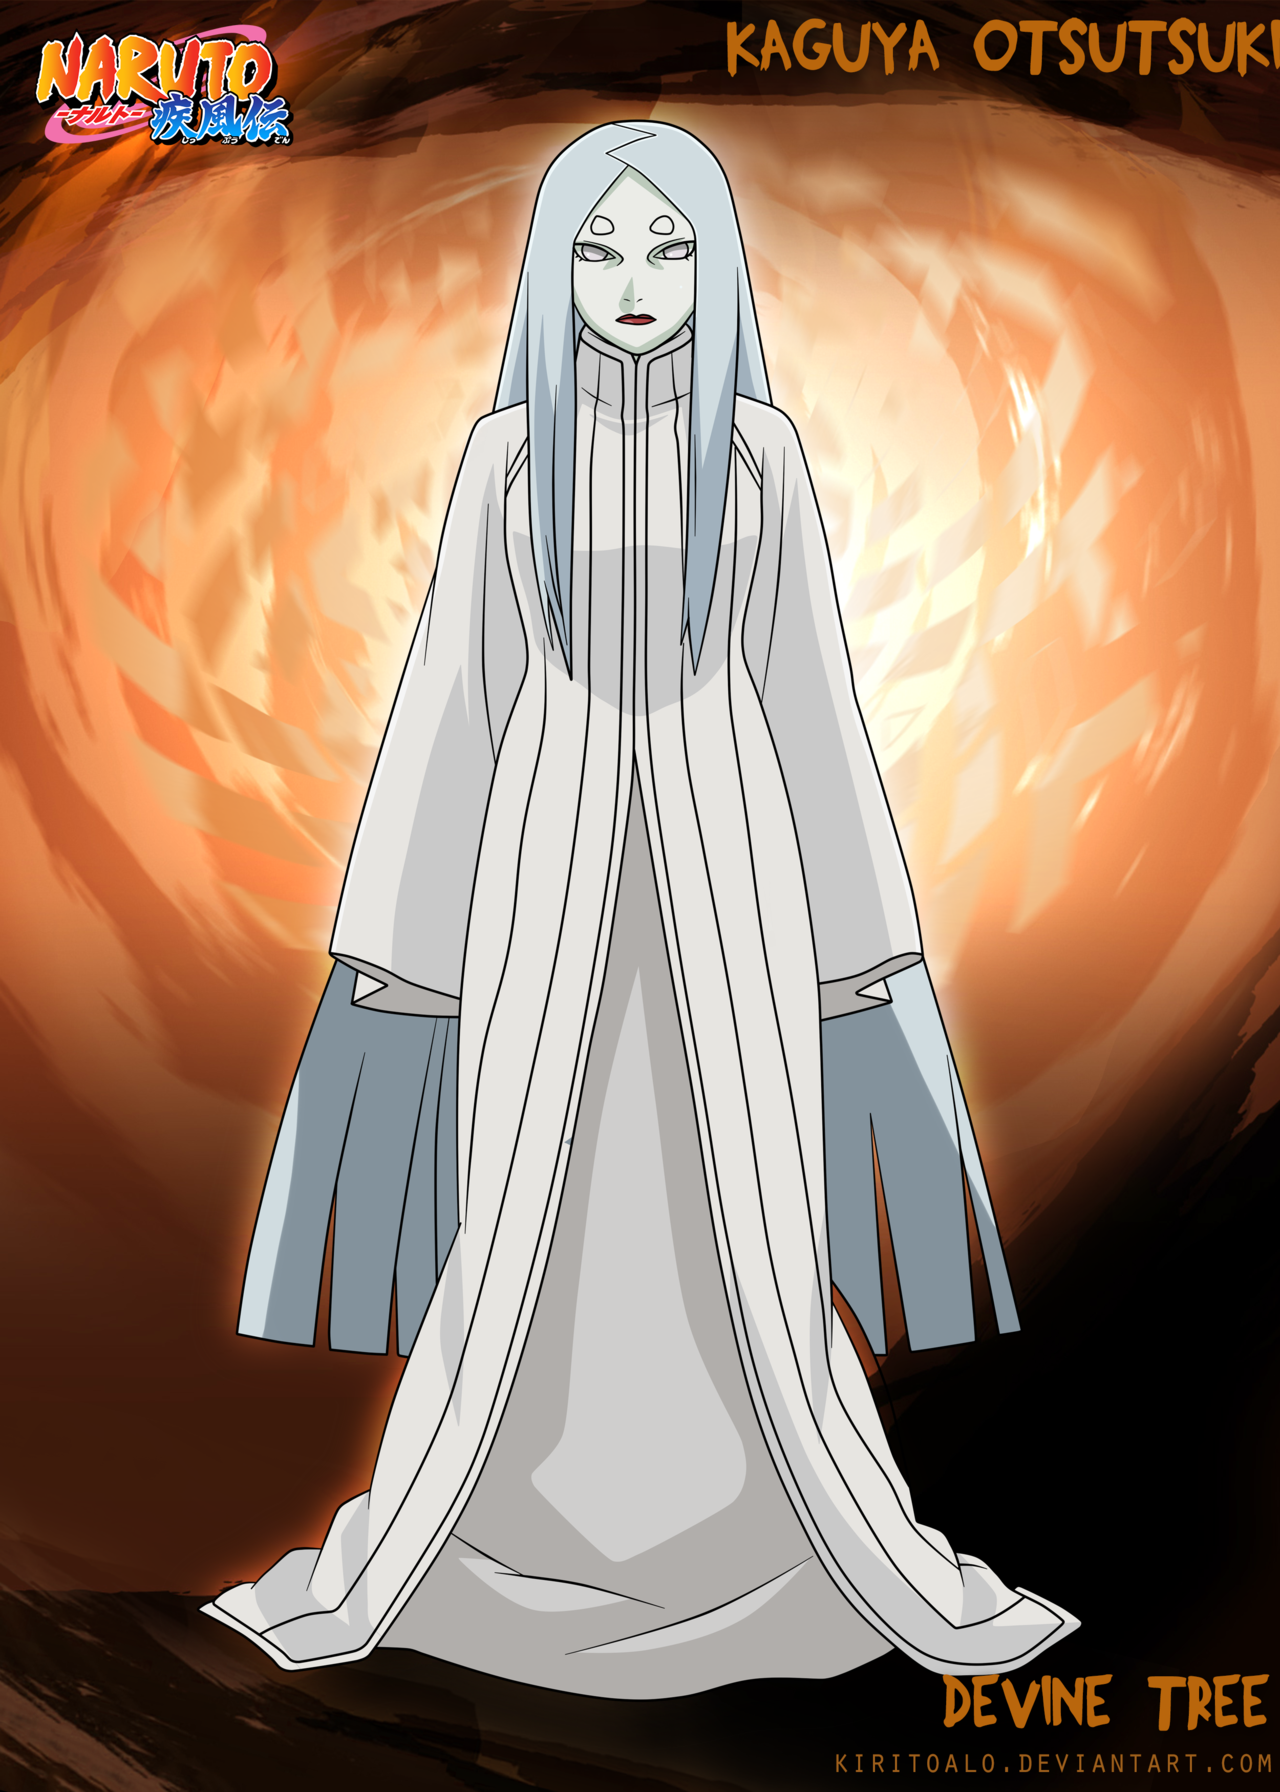 Kaguya Otsutsuki by KiritoALO imagens) Anime